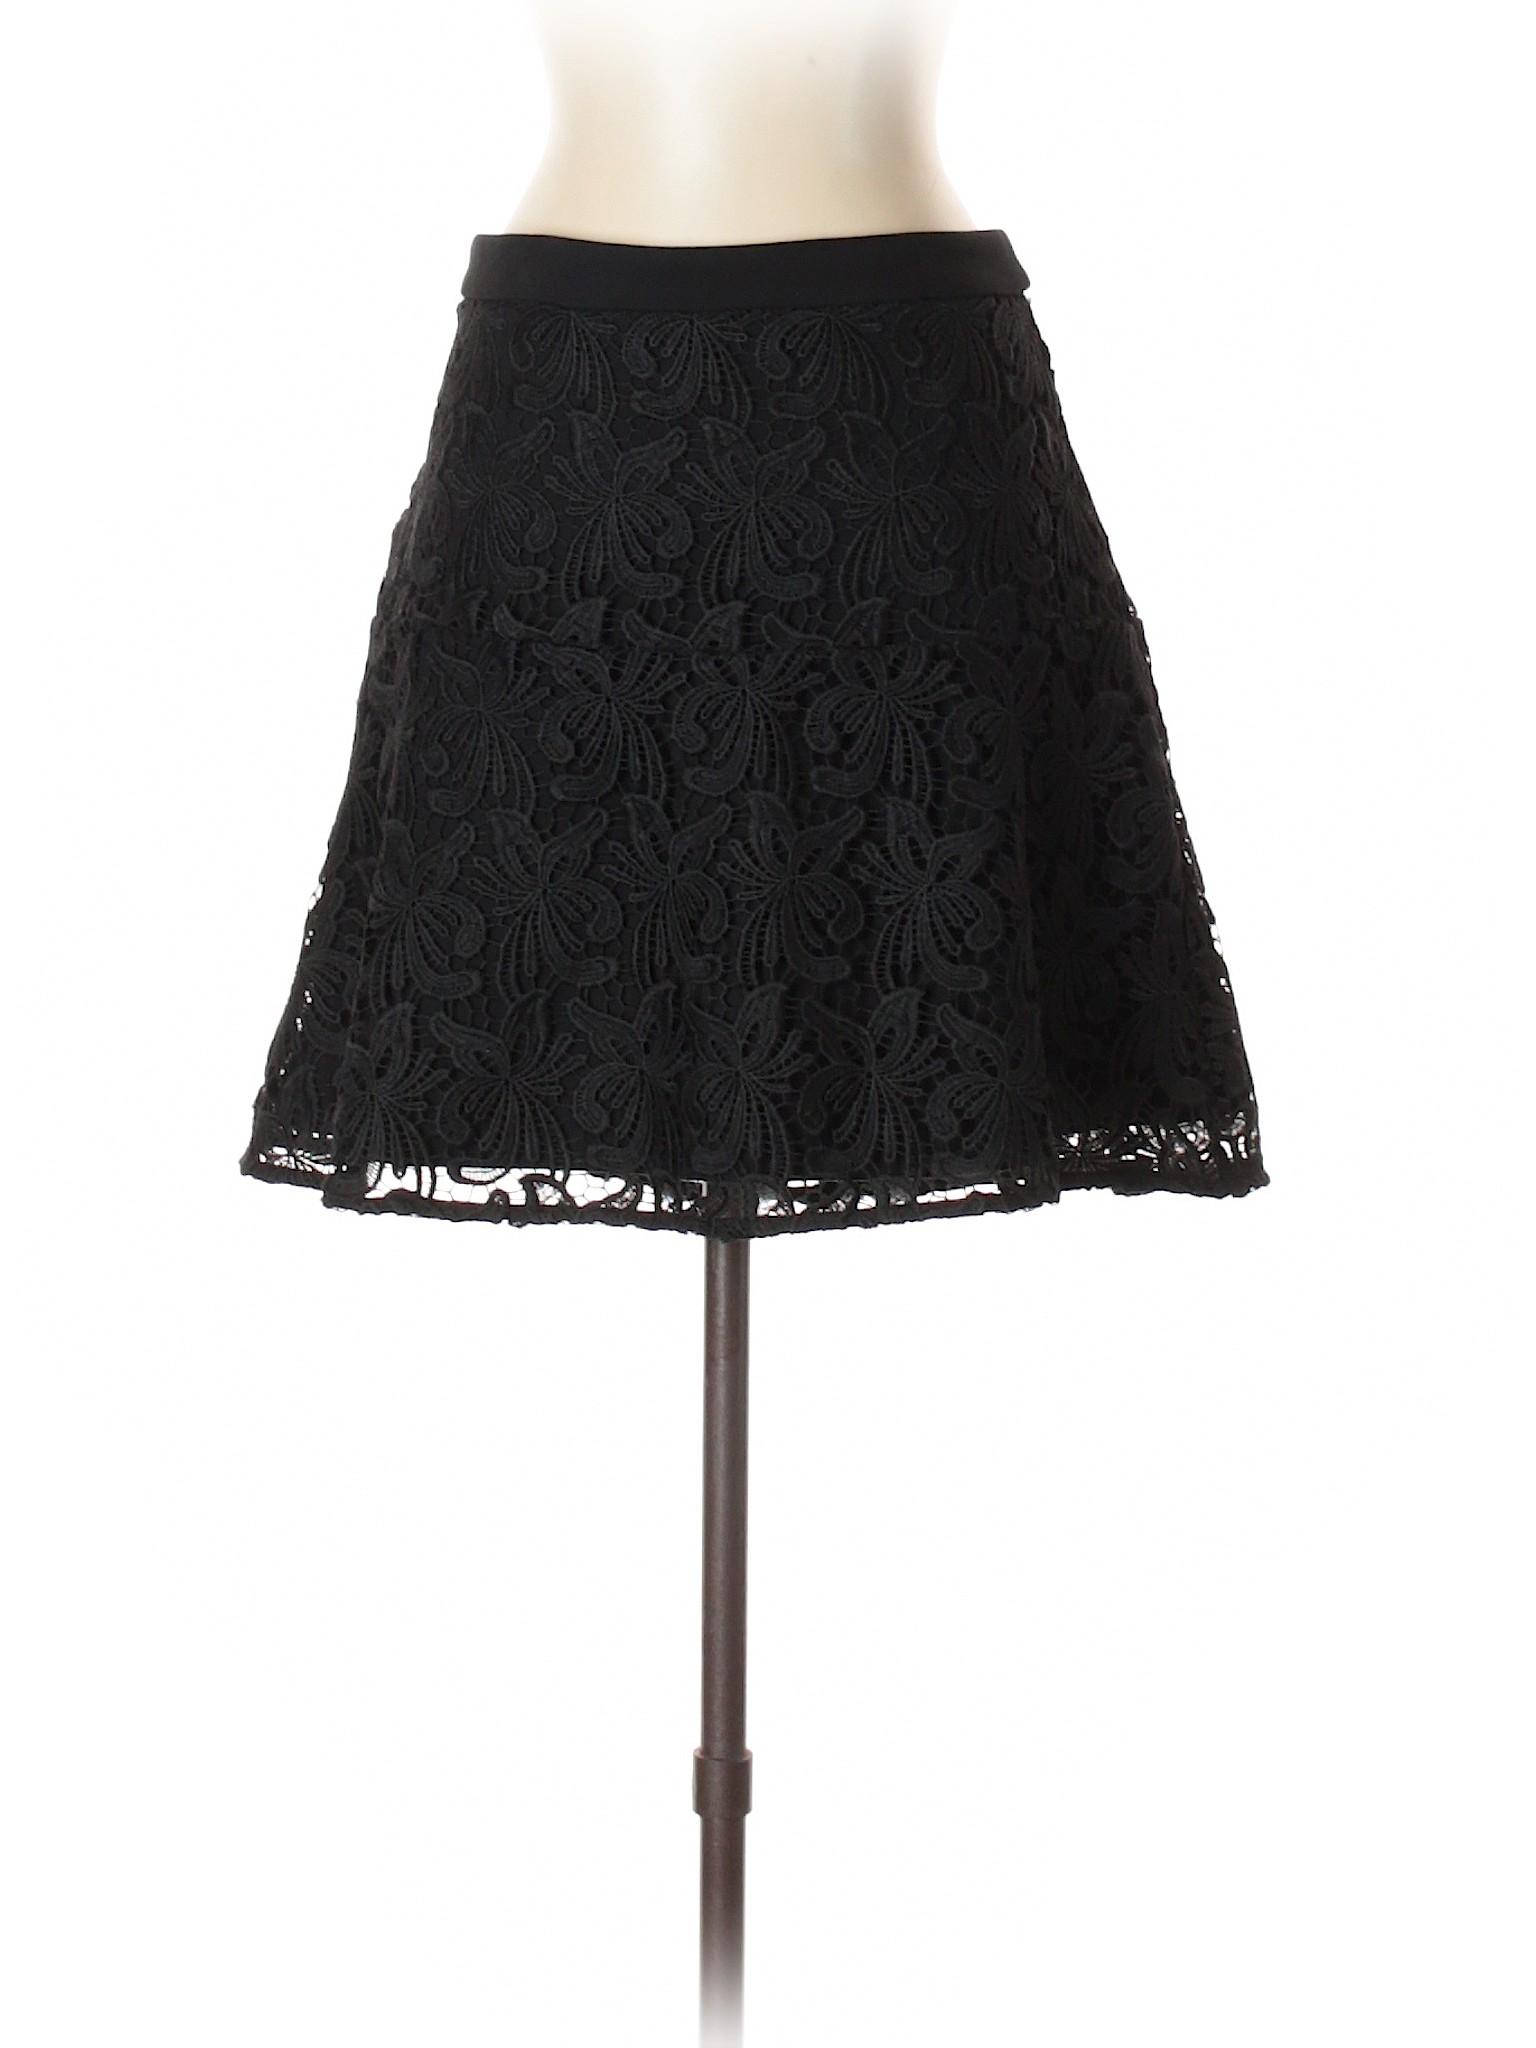 leisure Ann LOFT Taylor Boutique Skirt Casual Uqd1wxf